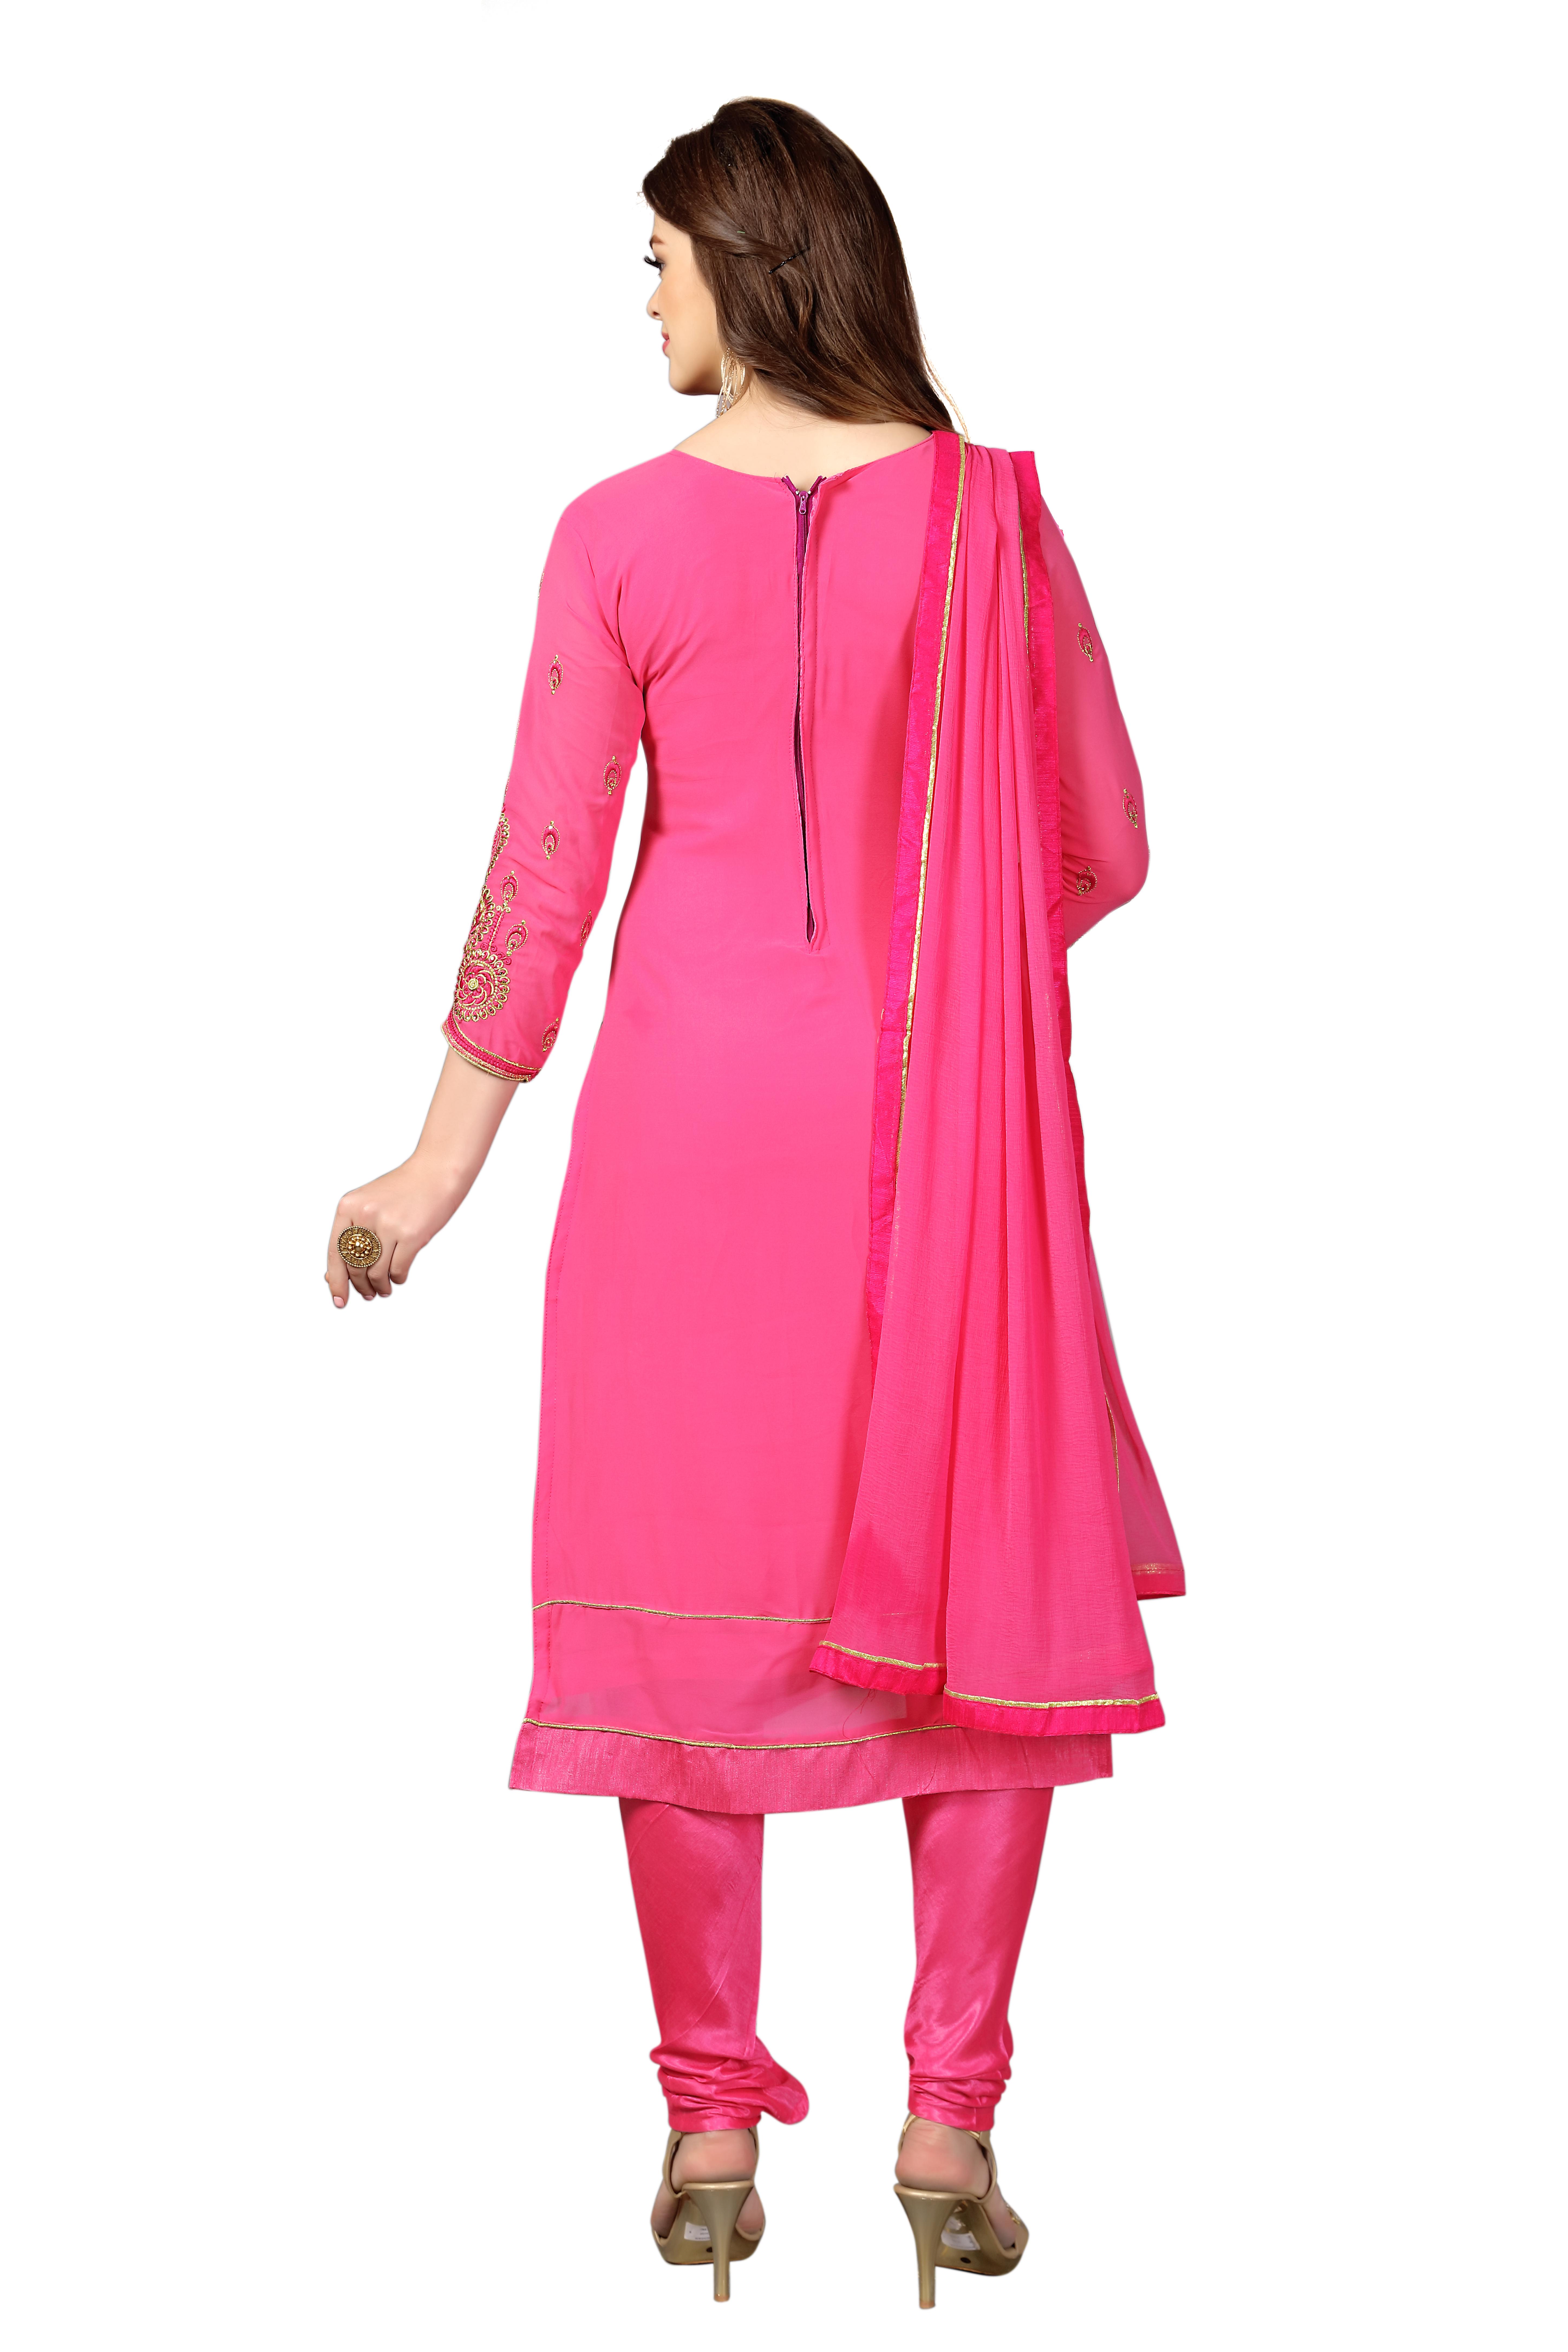 floral embroidered Georgette unstitched salwar suit In Pink